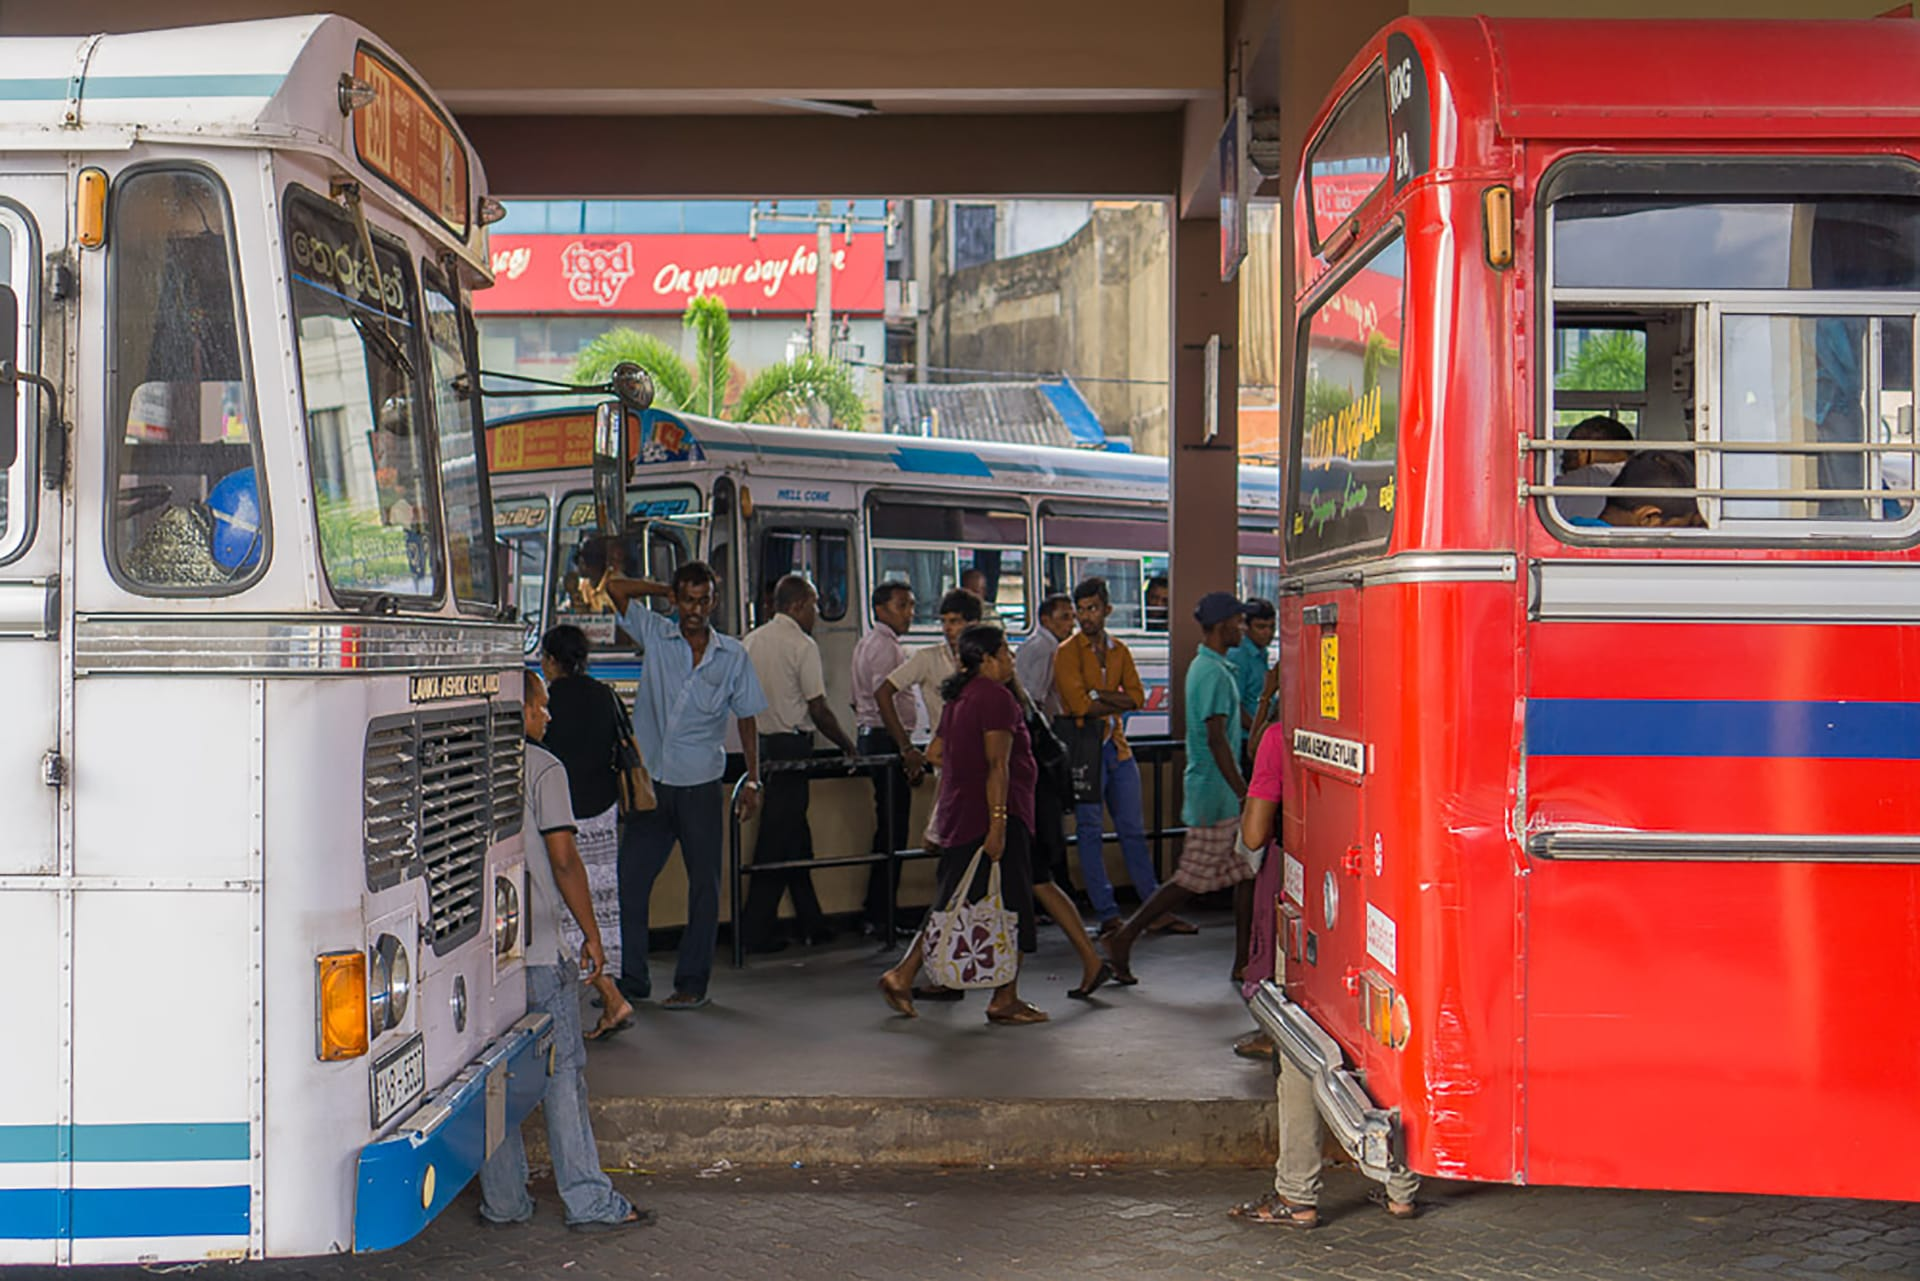 Reisebericht Galle Sri Lanka: Bus fahren